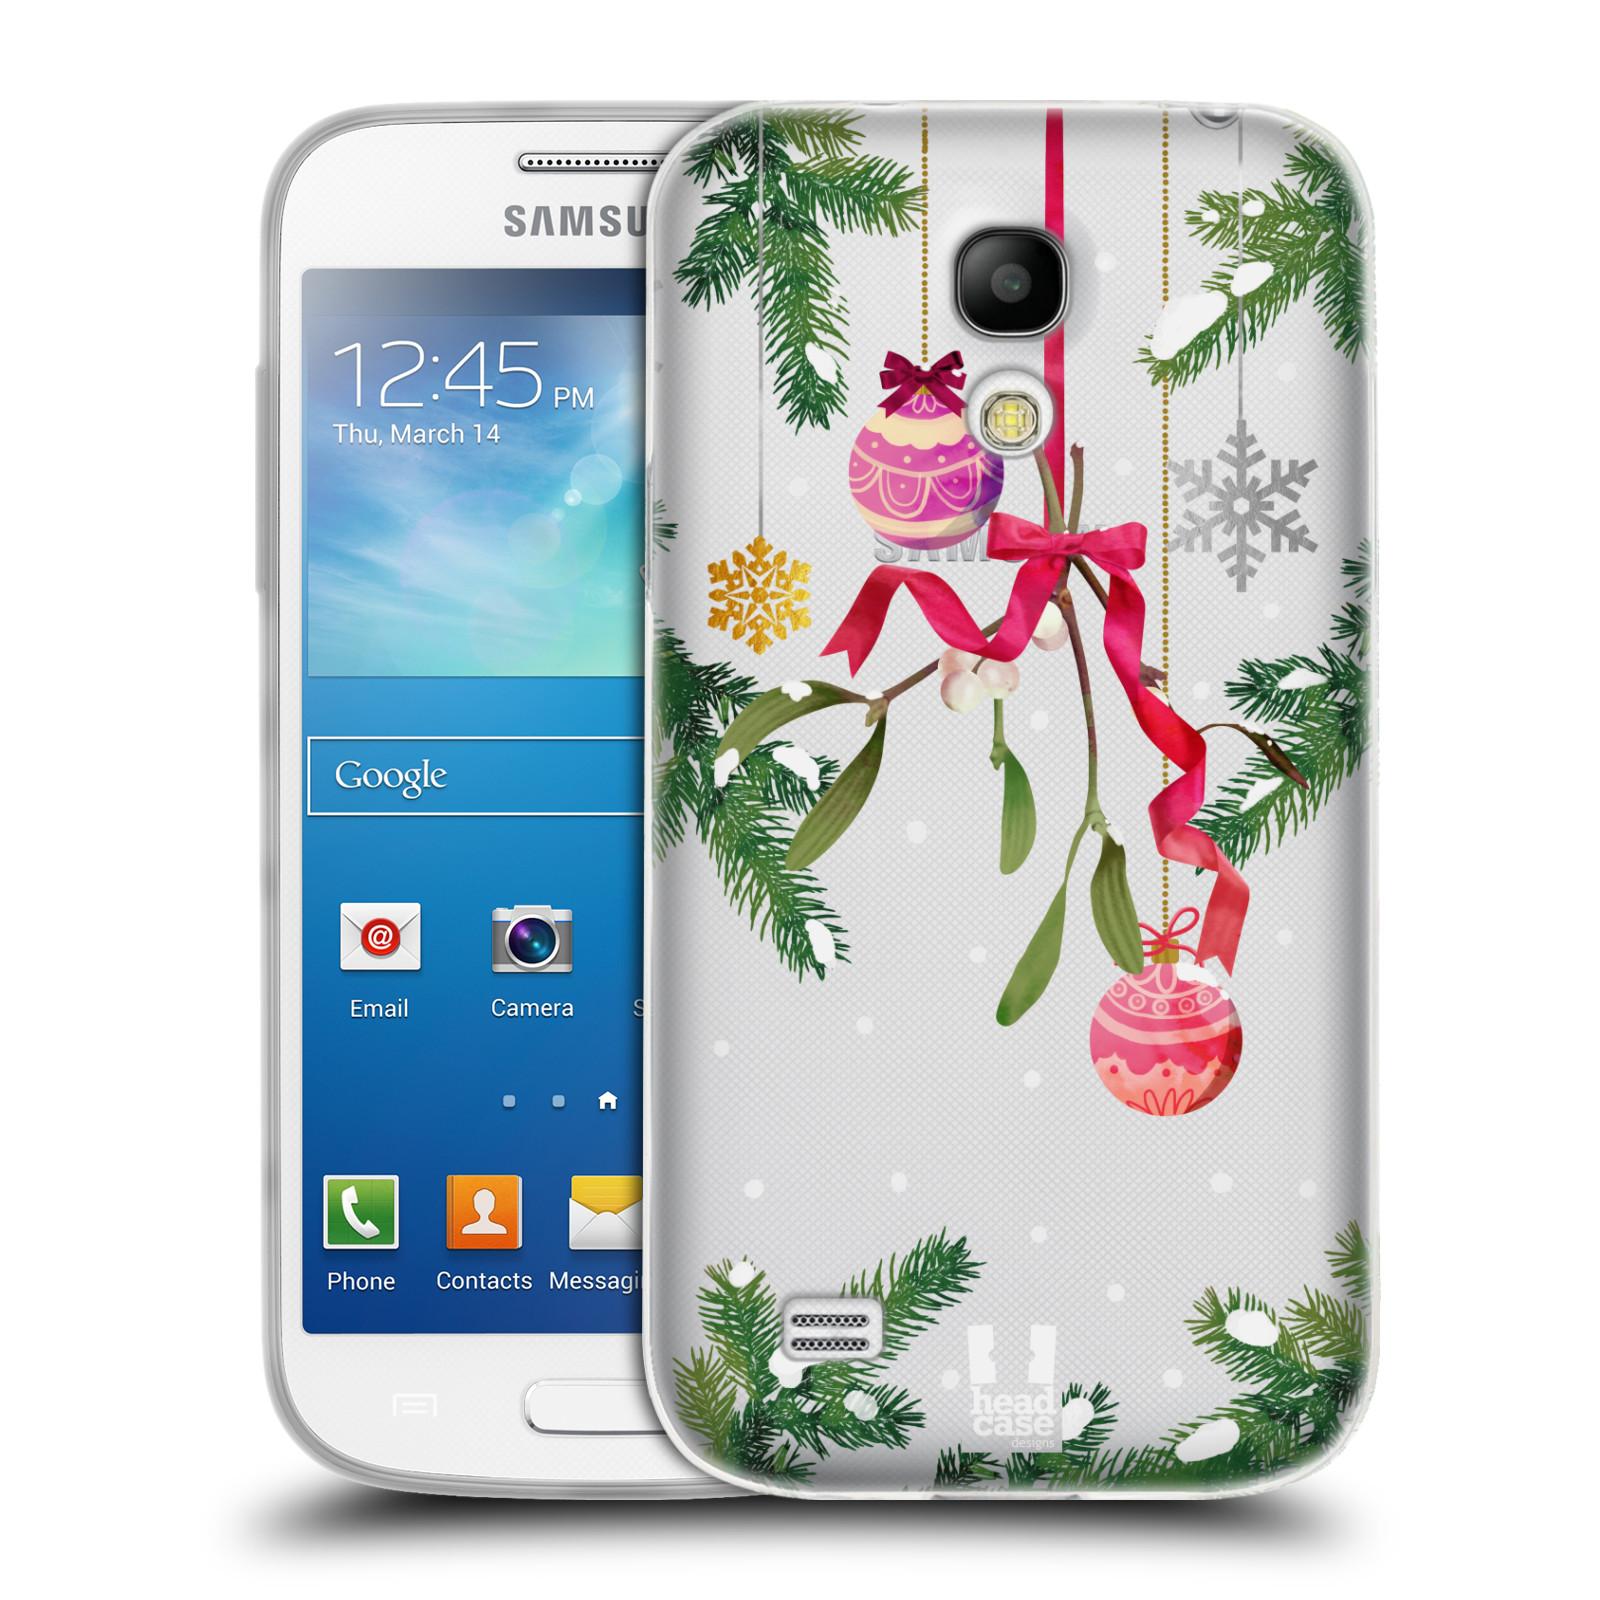 Silikonové pouzdro na mobil Samsung Galaxy S4 Mini - Head Case - Větvičky a vánoční ozdoby